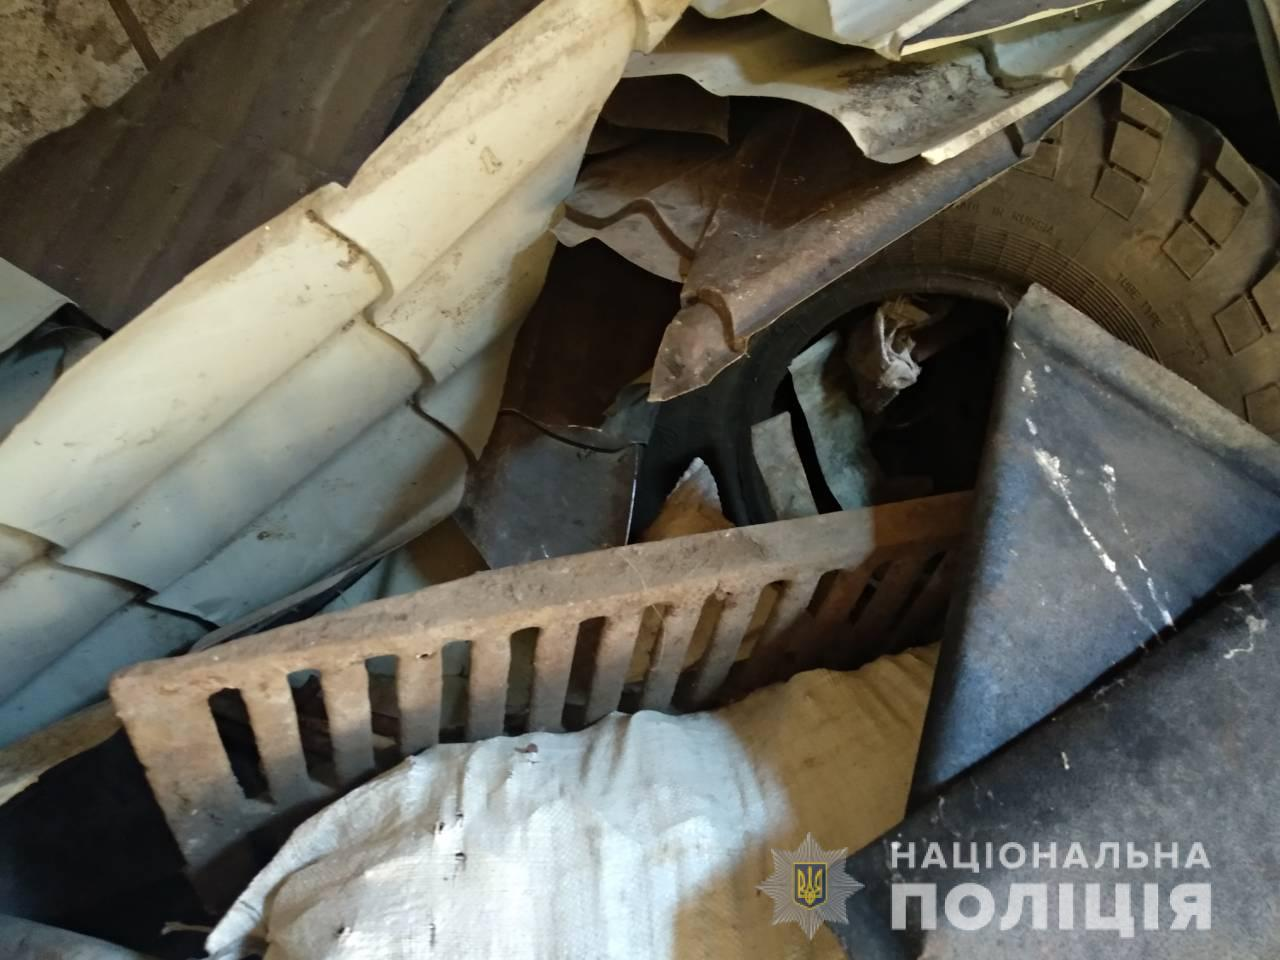 76142aef4ced На Харьковщине поймали мужчин, которые украли центнер металла ...